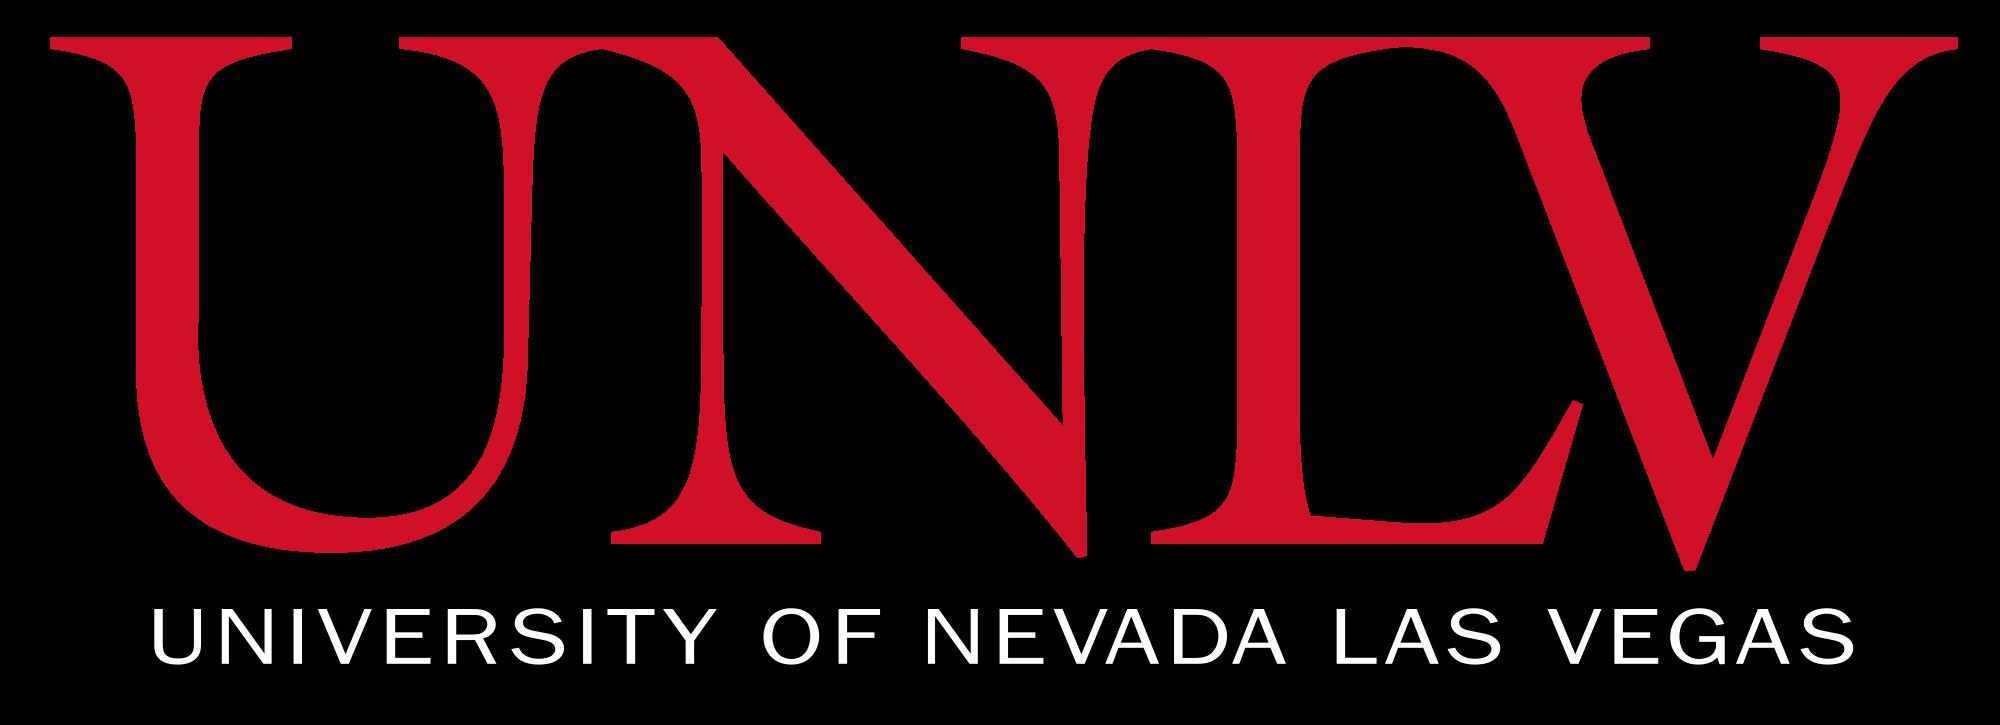 2000px-UNLV_Logo.svg